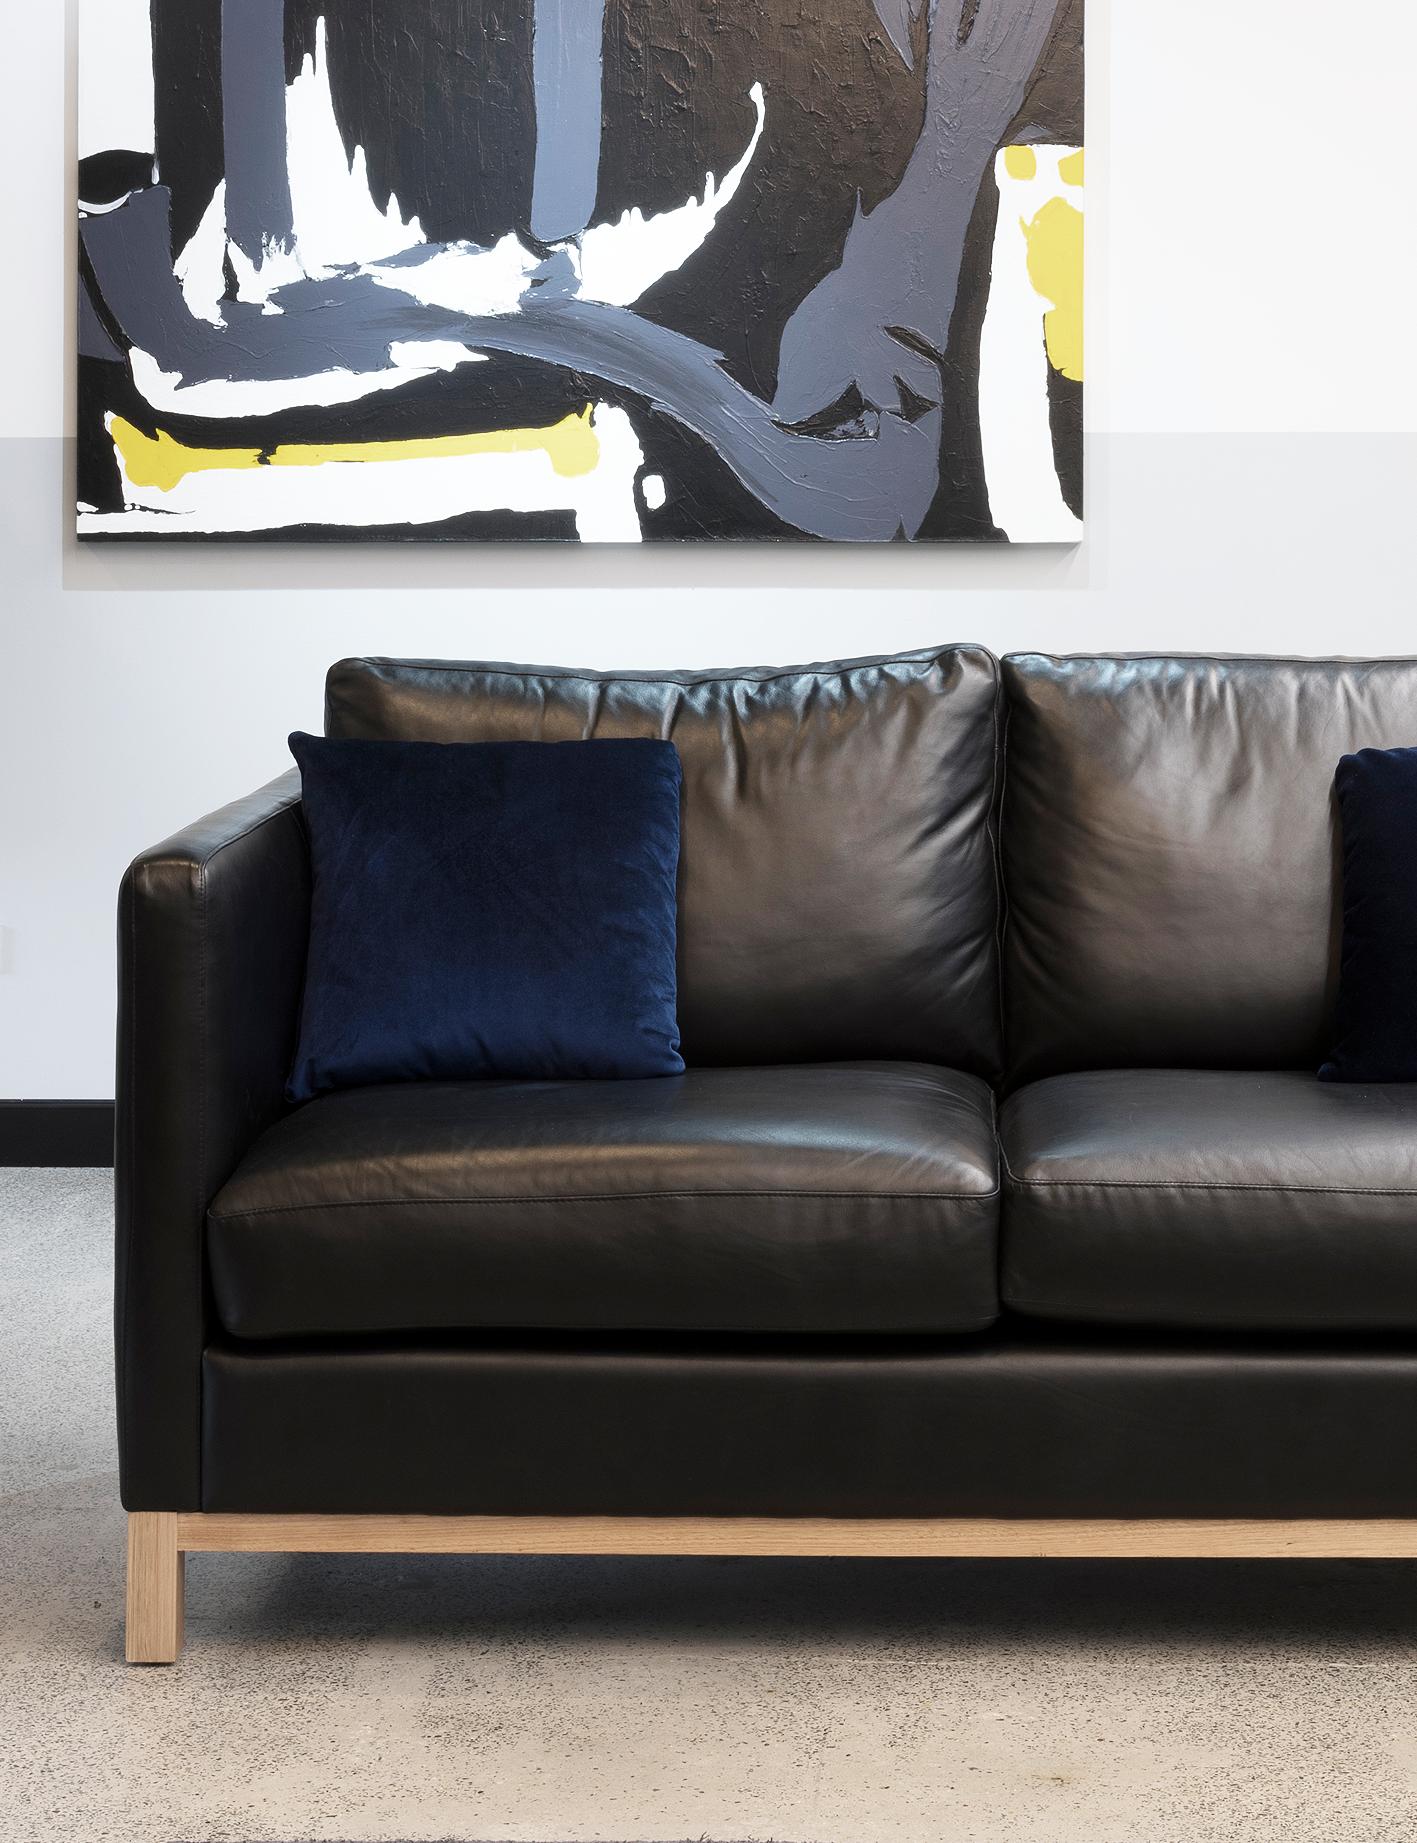 Nero luxe 2 seater – Custom designed / created lounge